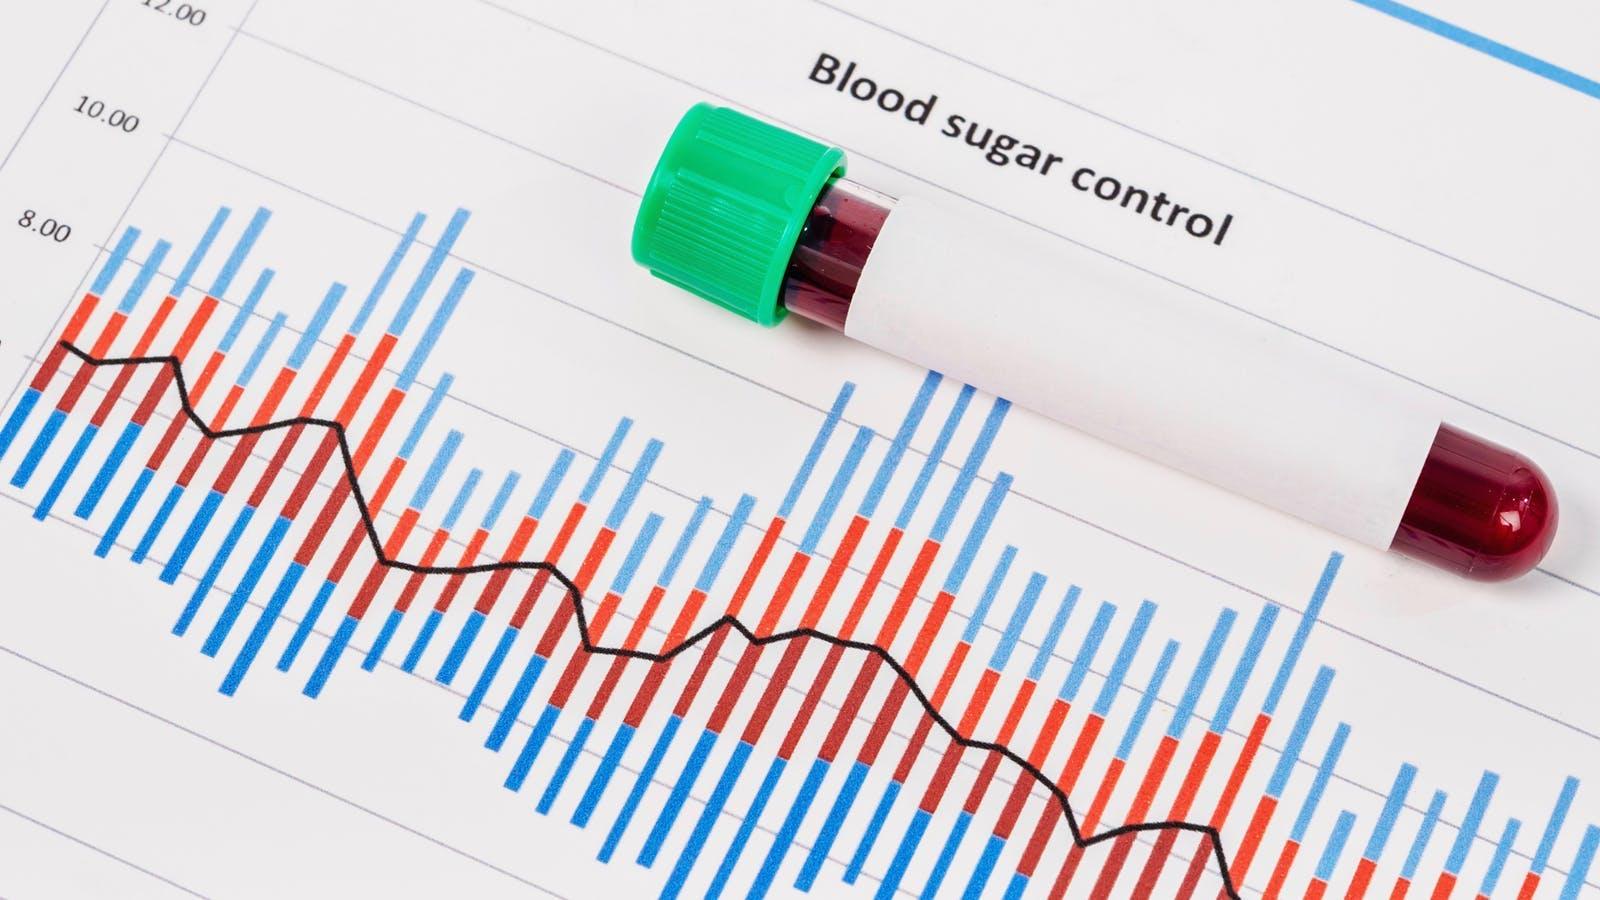 Sample blood for screening diabetic test